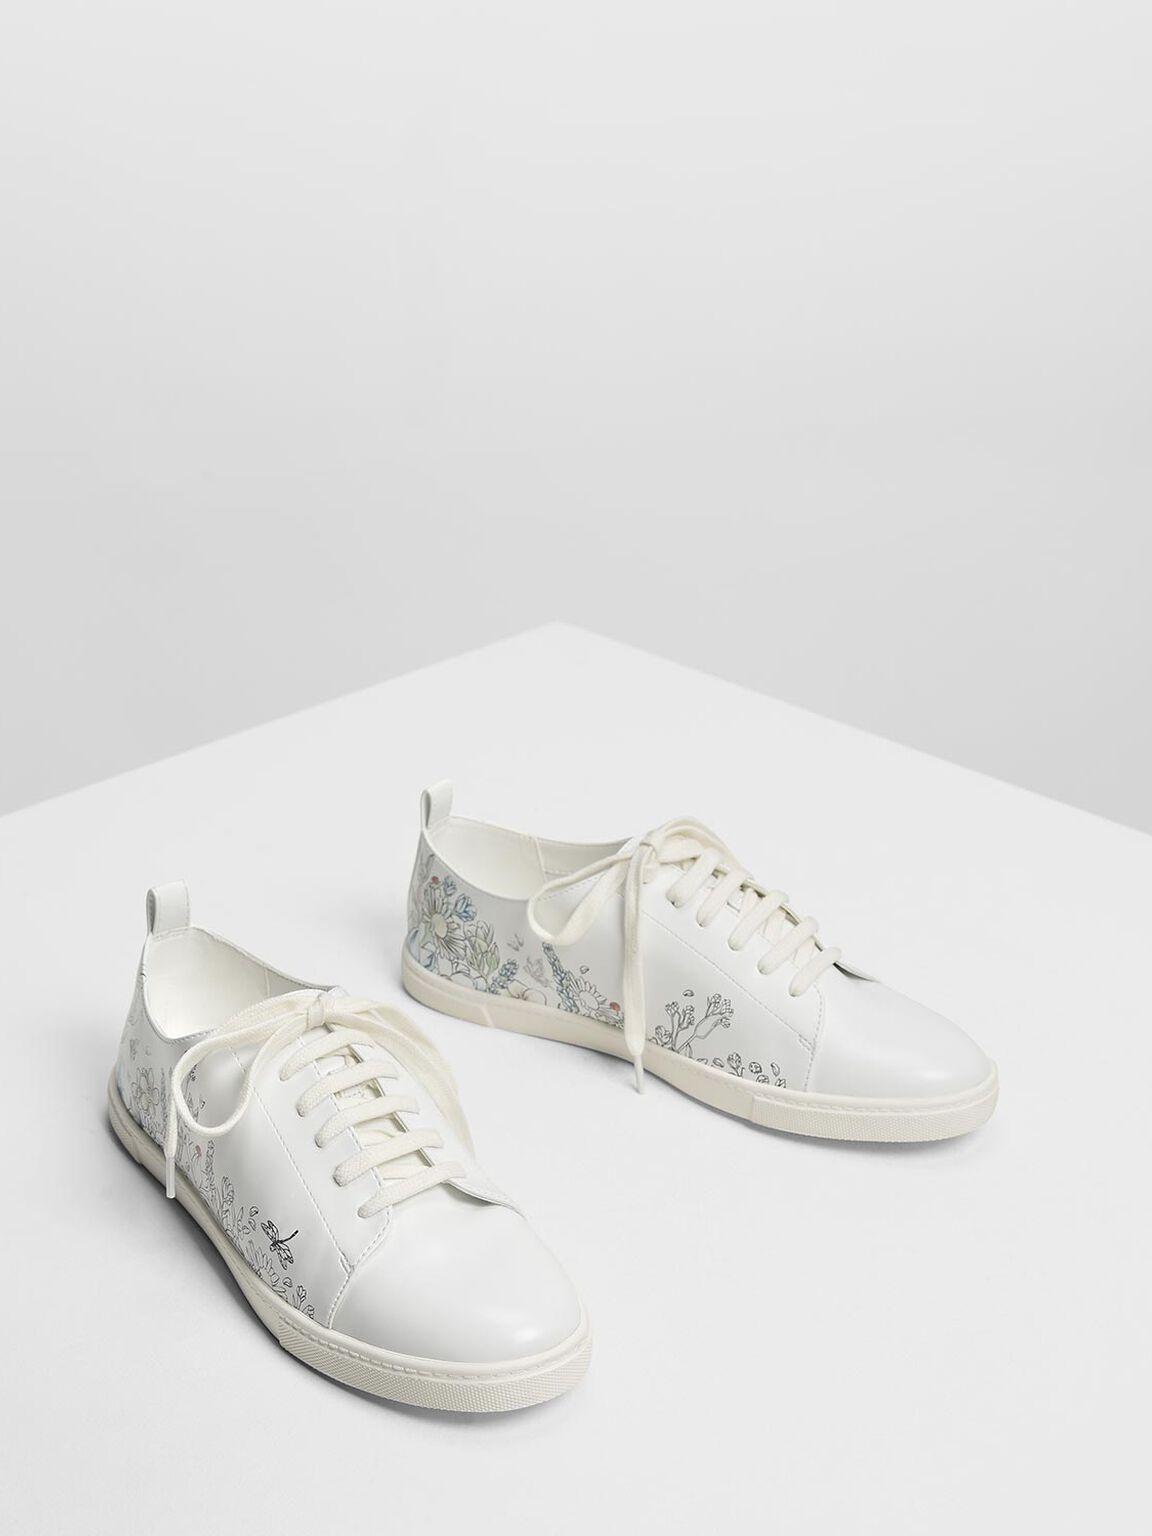 Garden Print Sneakers, White, hi-res